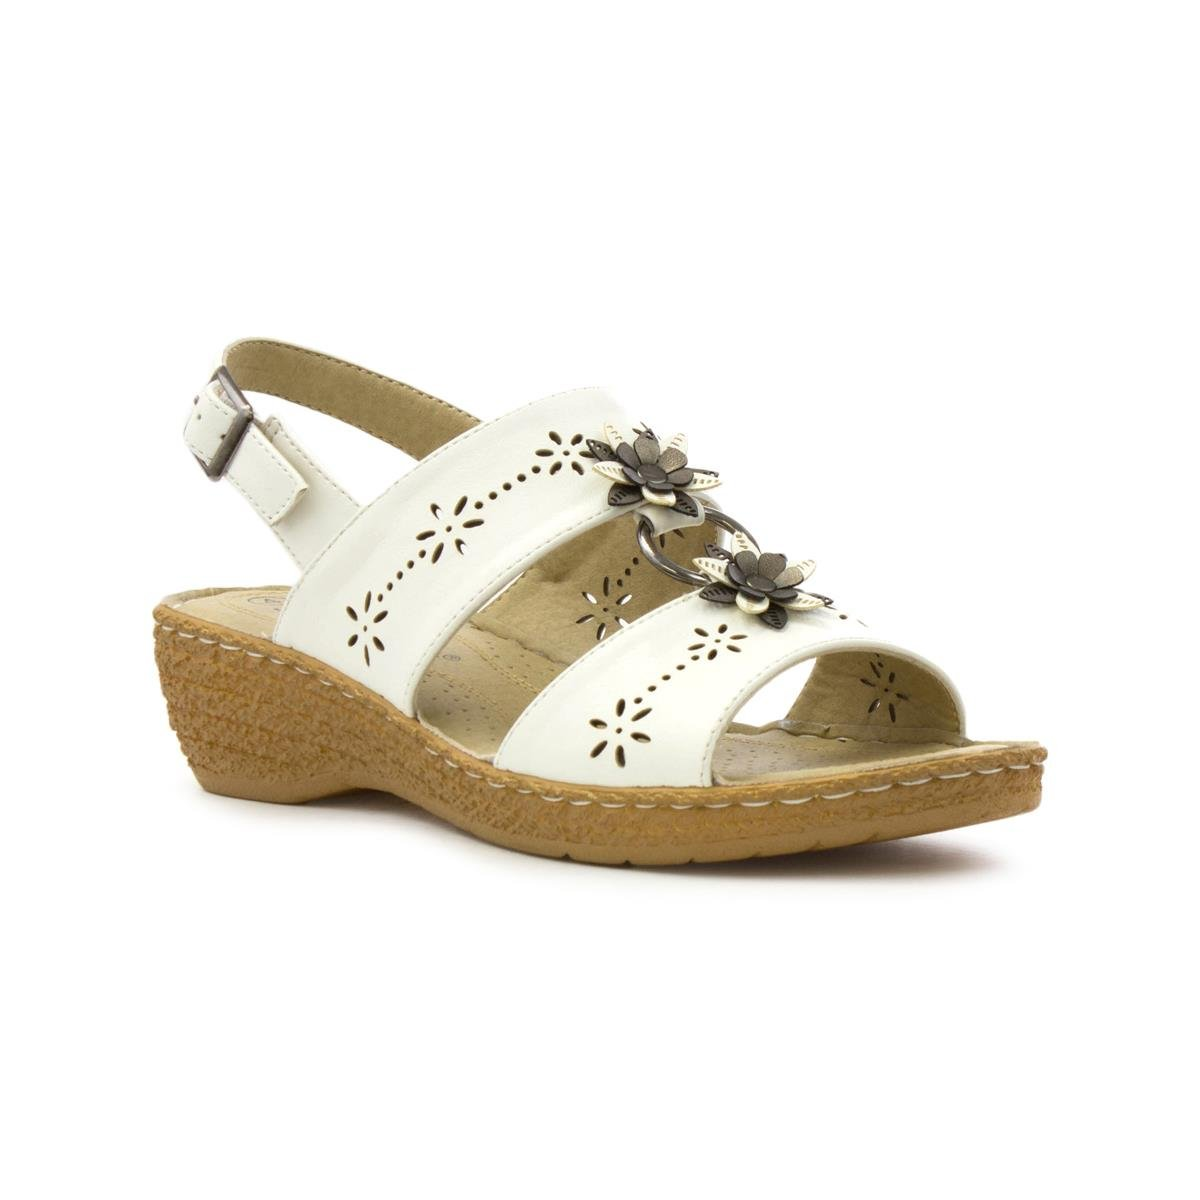 97a235878c47f Softlites Womens White Wedge Comfort Sandal